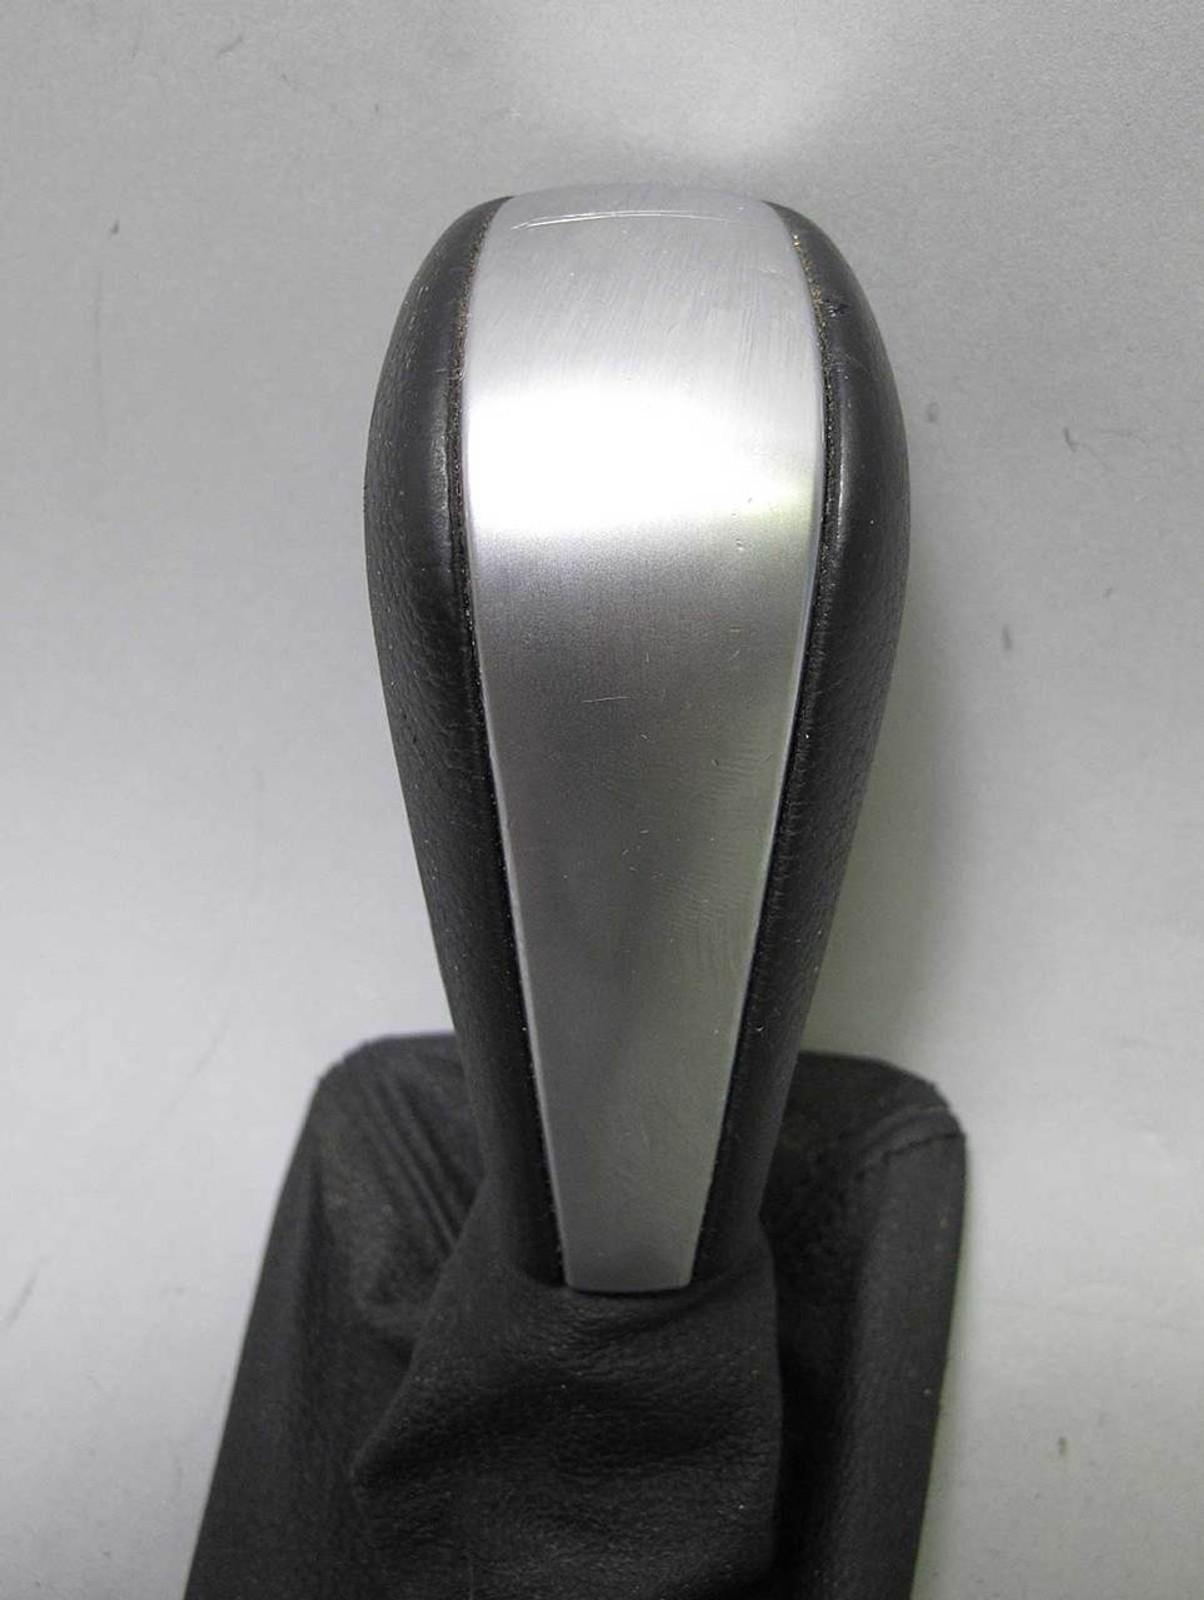 Bmw E90 E92 E93 3 Series Shift Knob Chrome Black Leather W Boot For Auto Oem